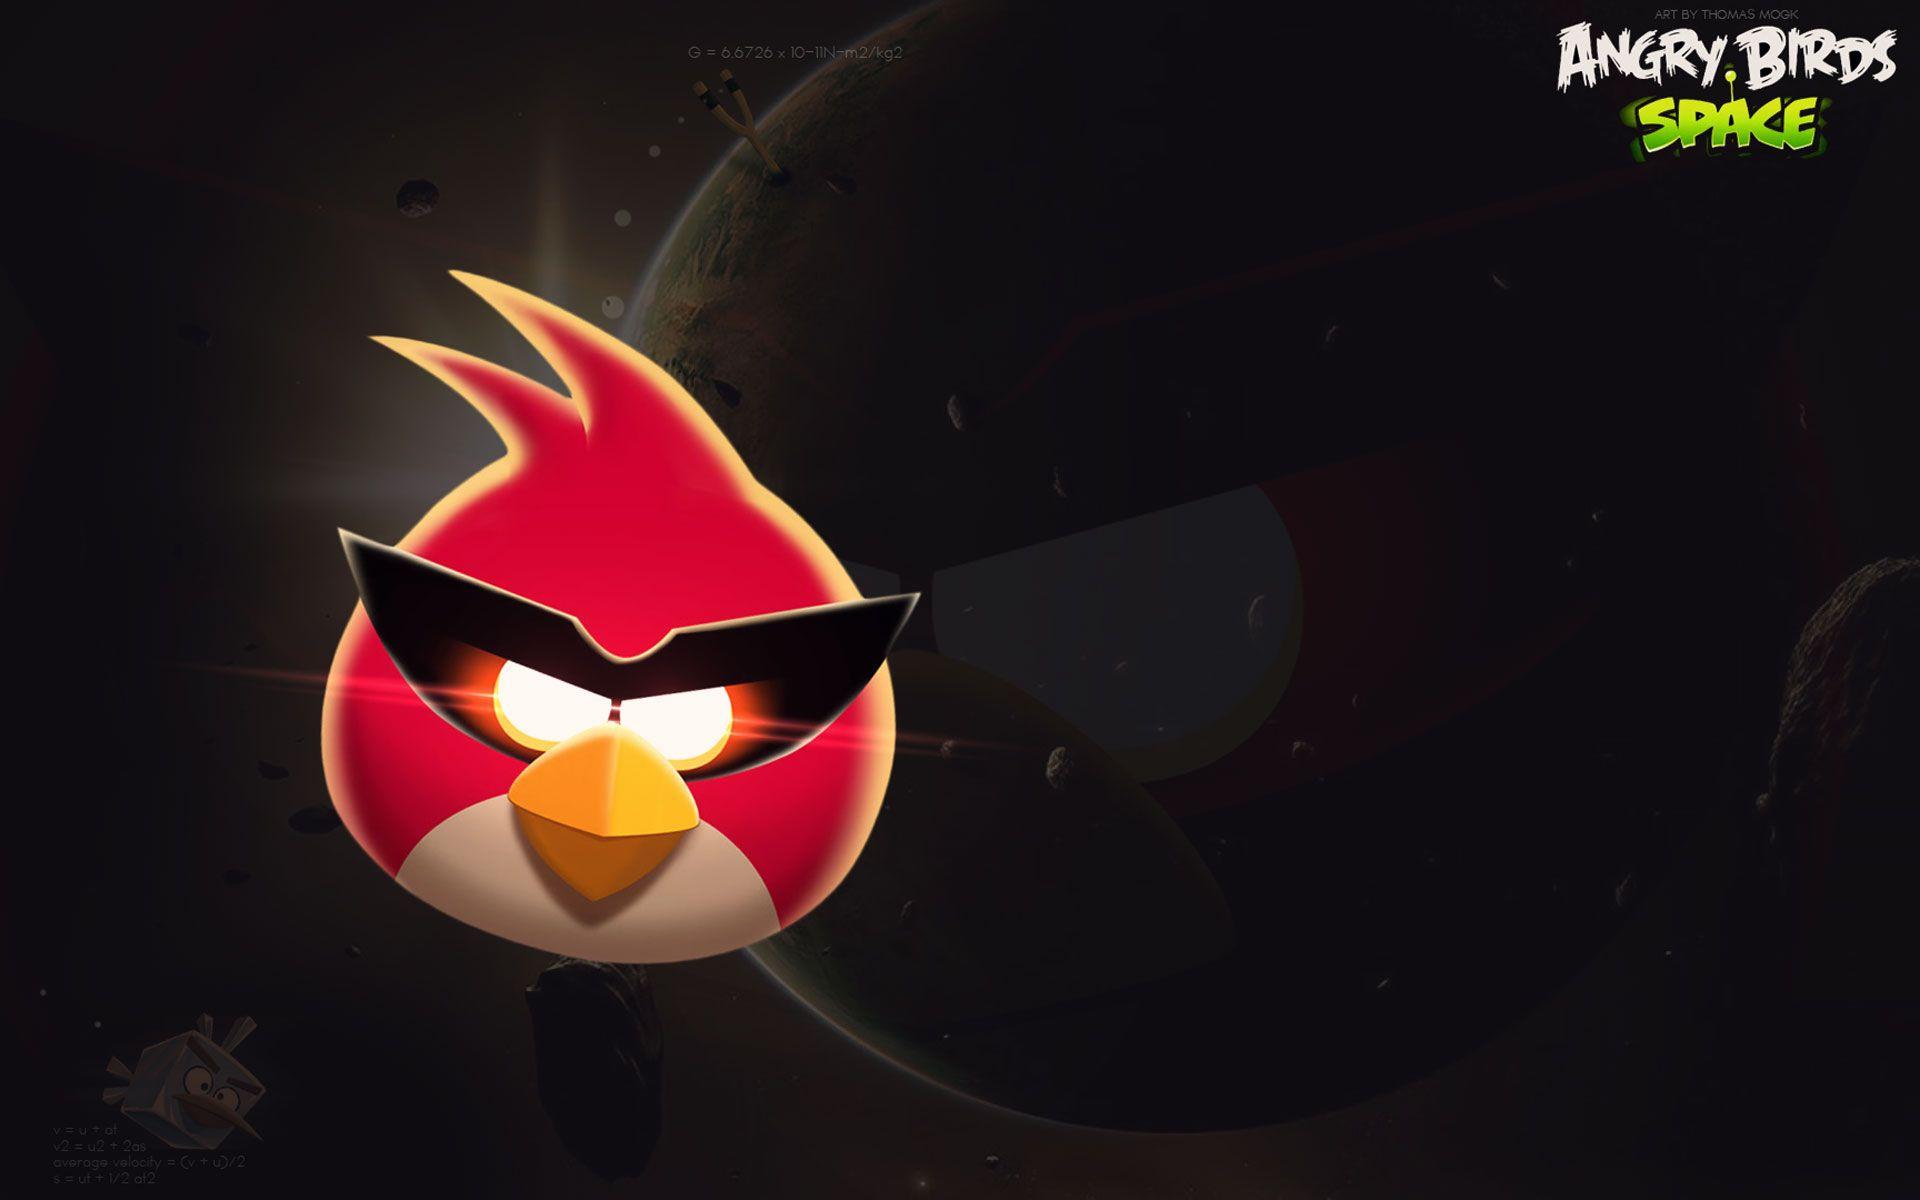 Red Bird Space Wallpaper